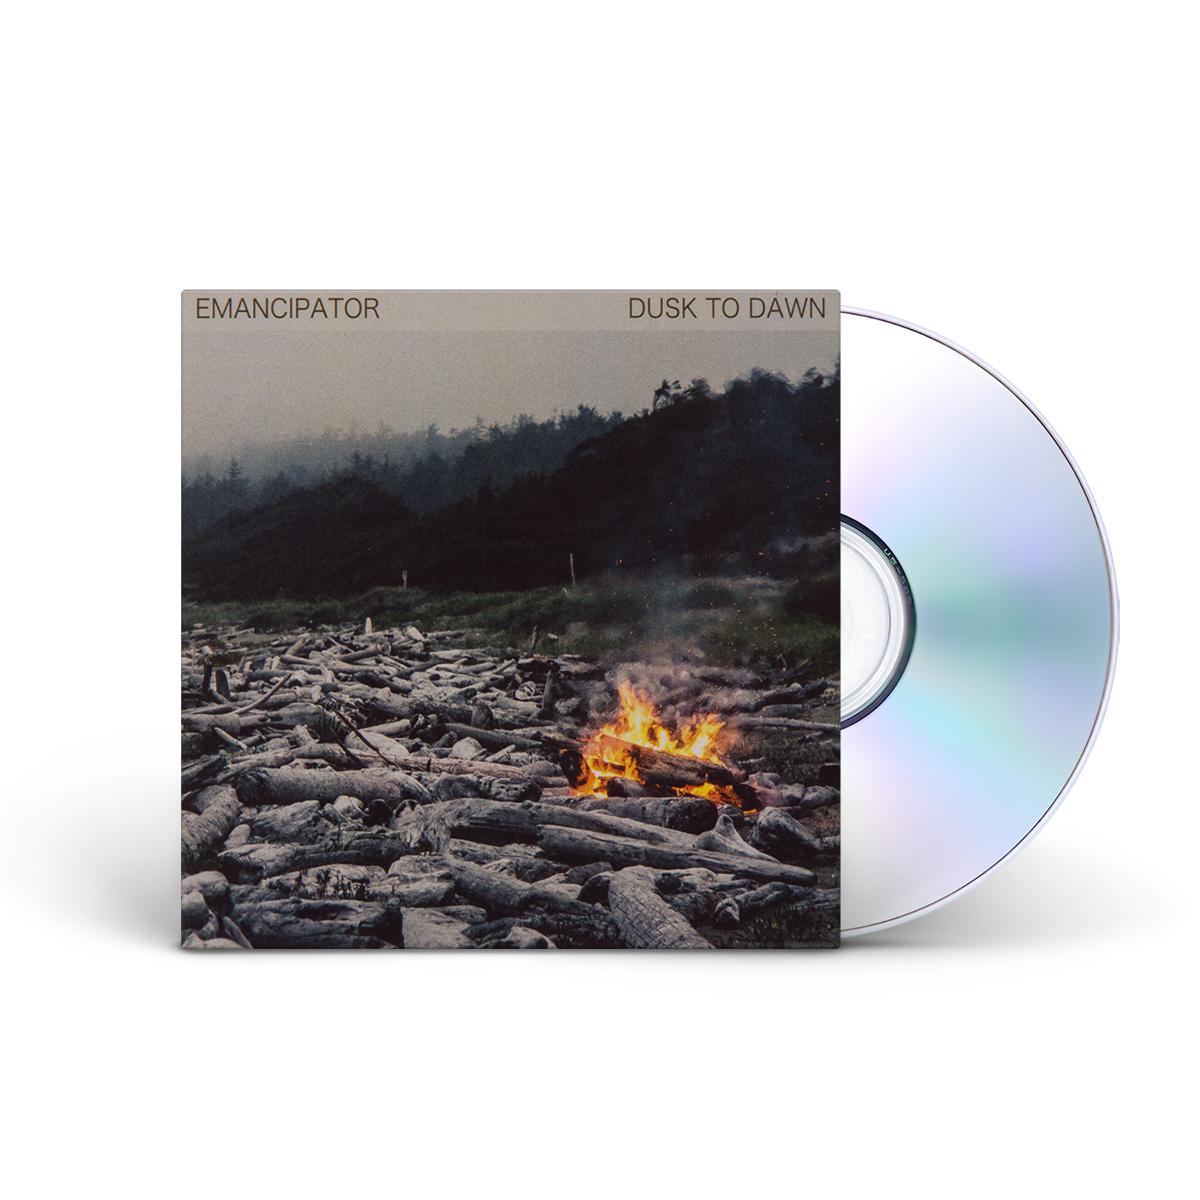 Emancipator Dusk to Dawn CD